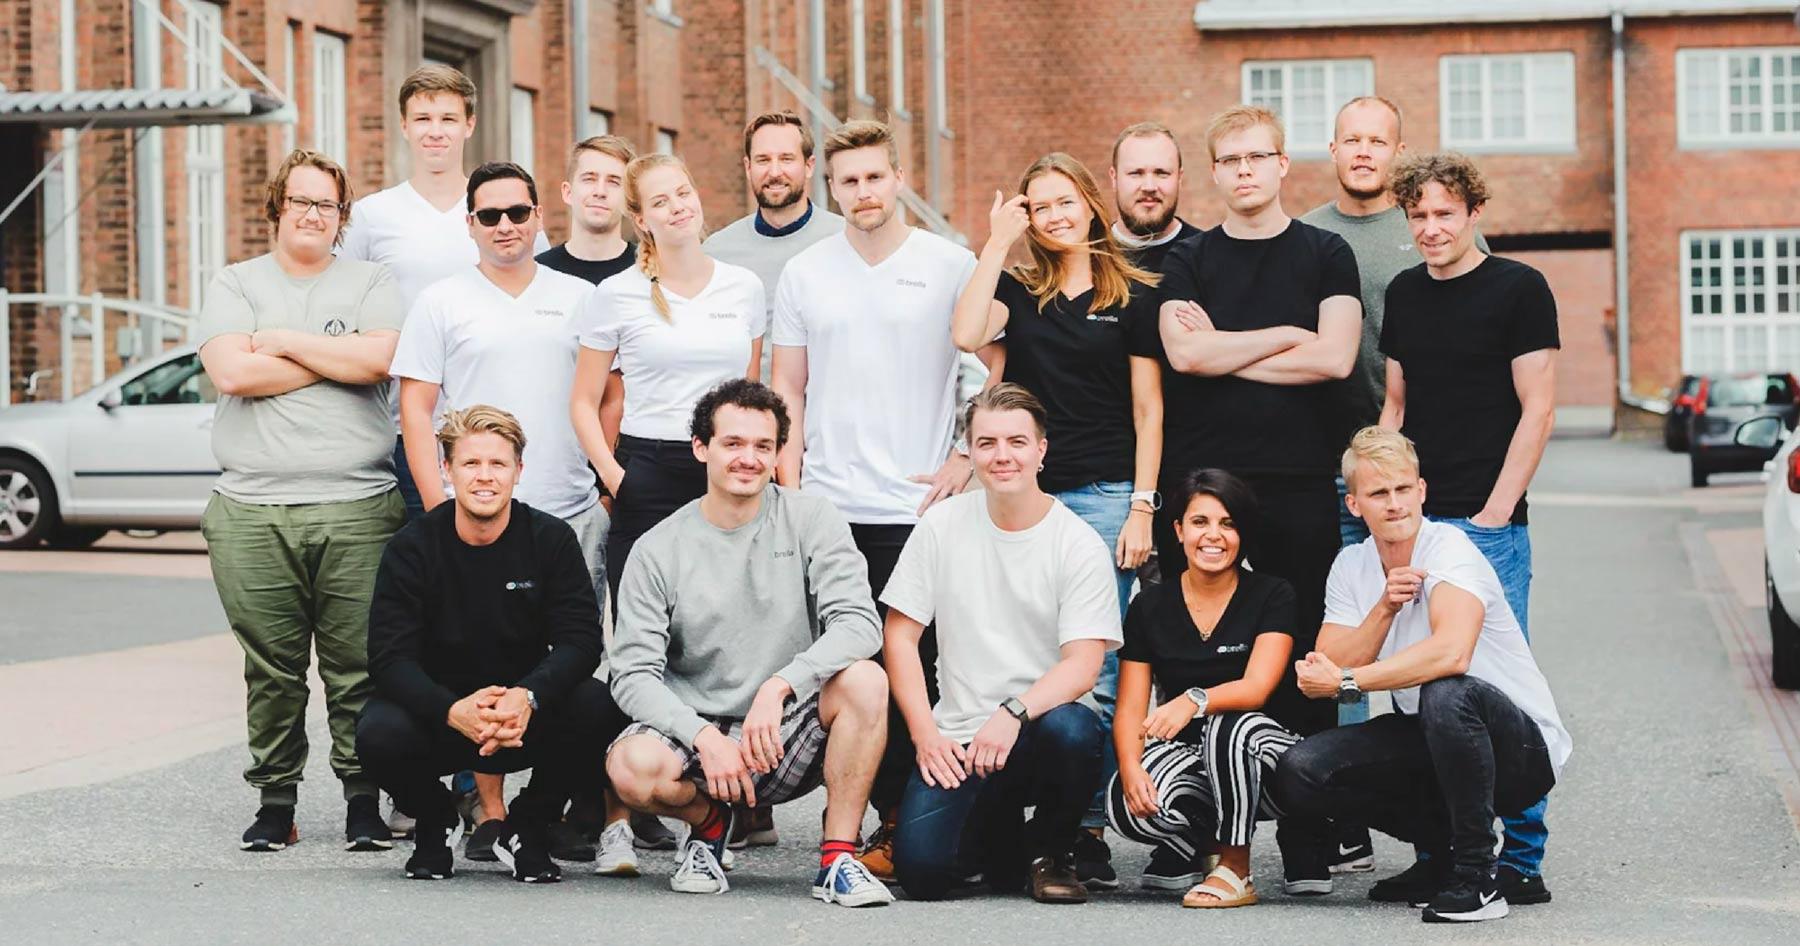 The Brella Customer Success Team